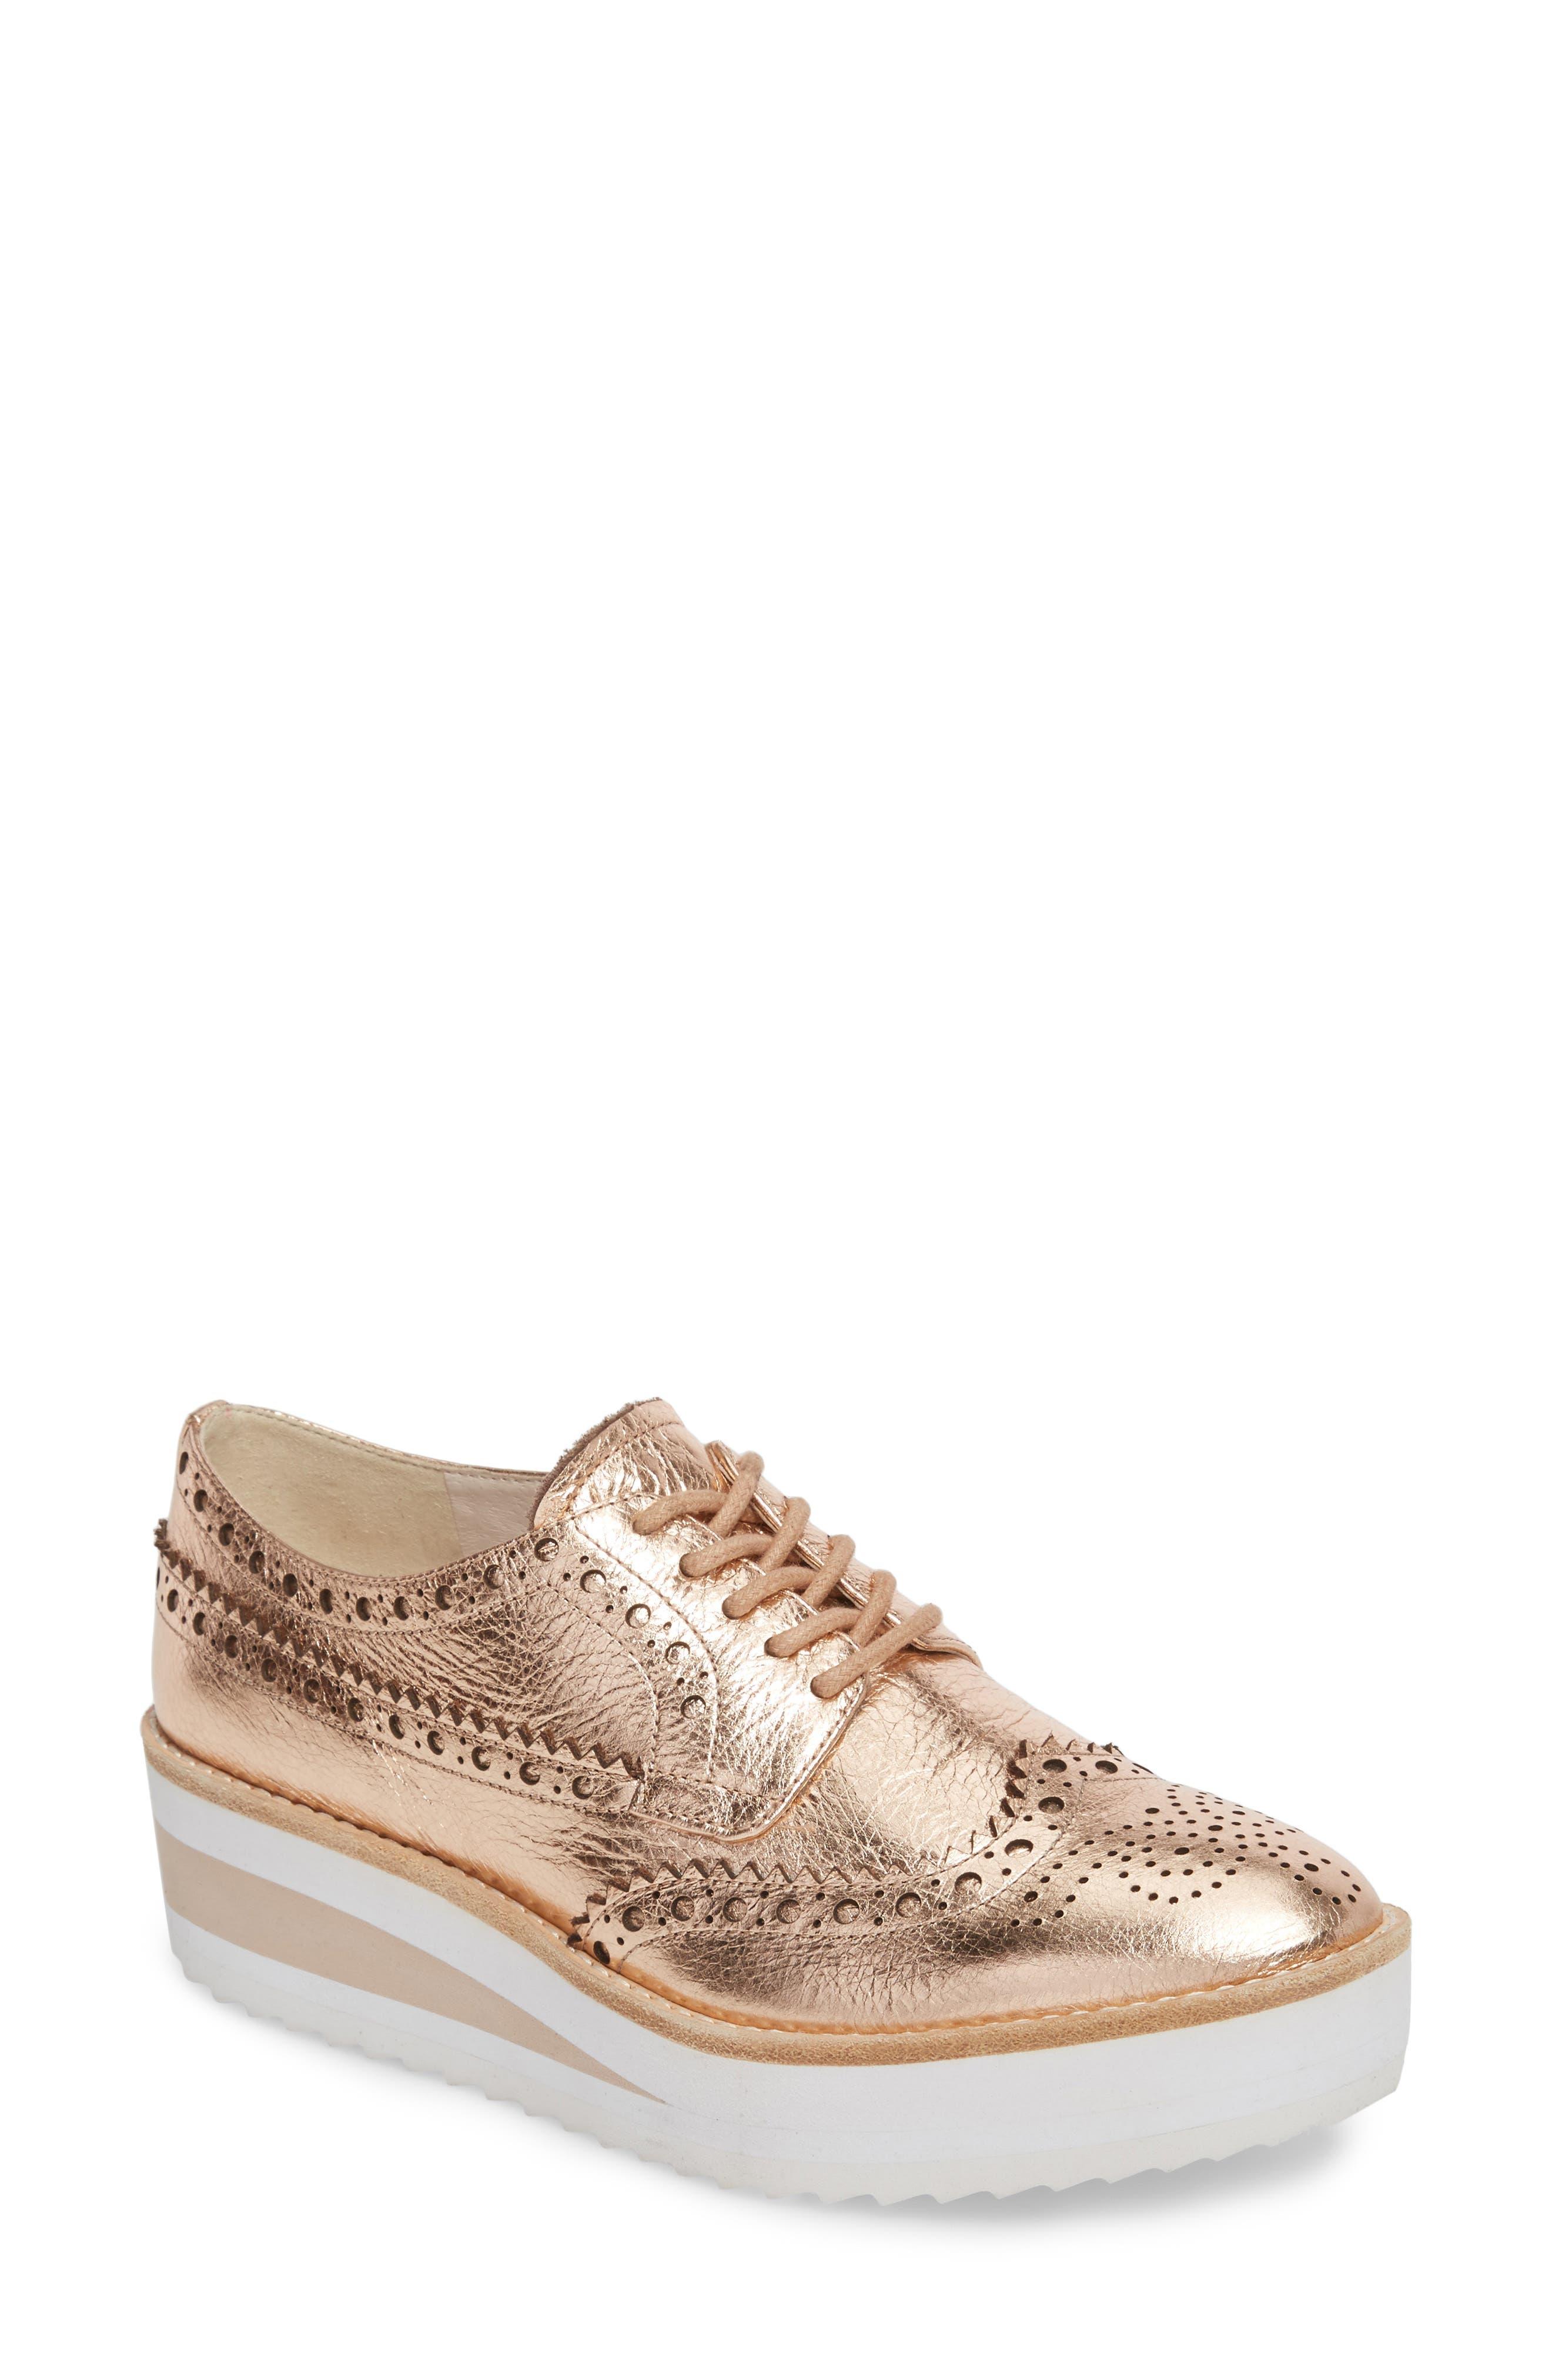 Alternate Image 1 Selected - Kenneth Cole New York Roberta Platform Sneaker (Women)